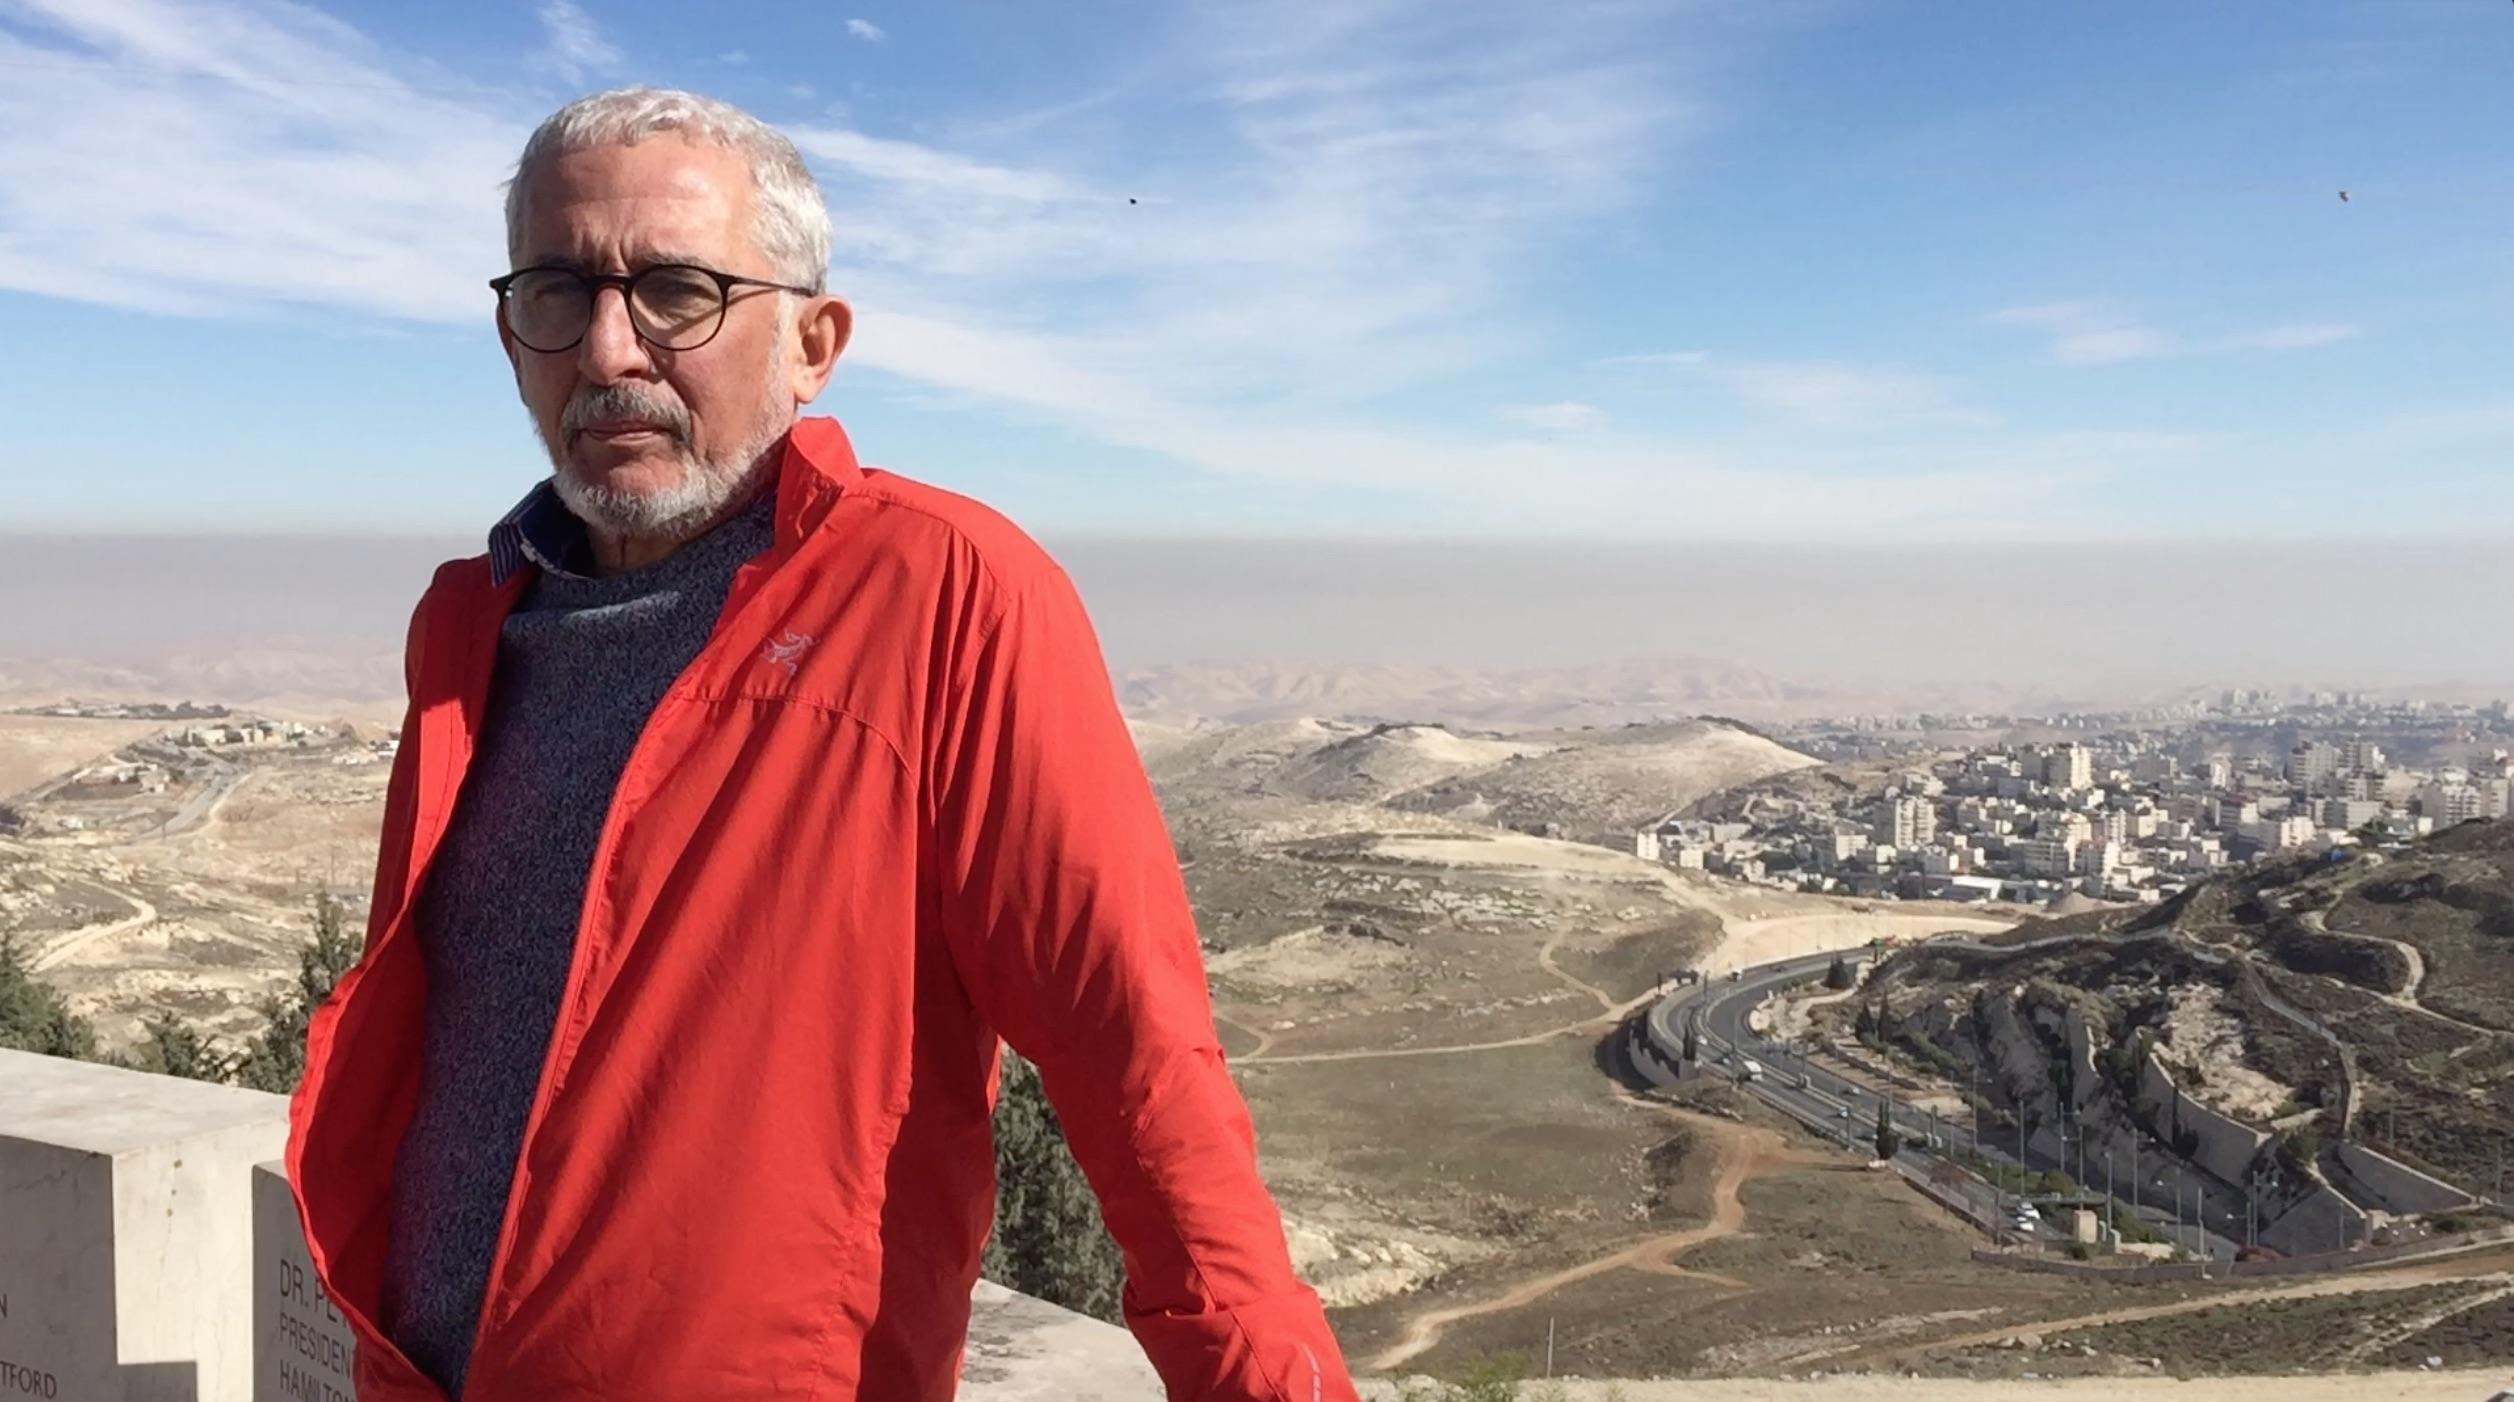 Danny Seidemann Jerusalem expert and director of Terrestial Jerusalem, looking over the city